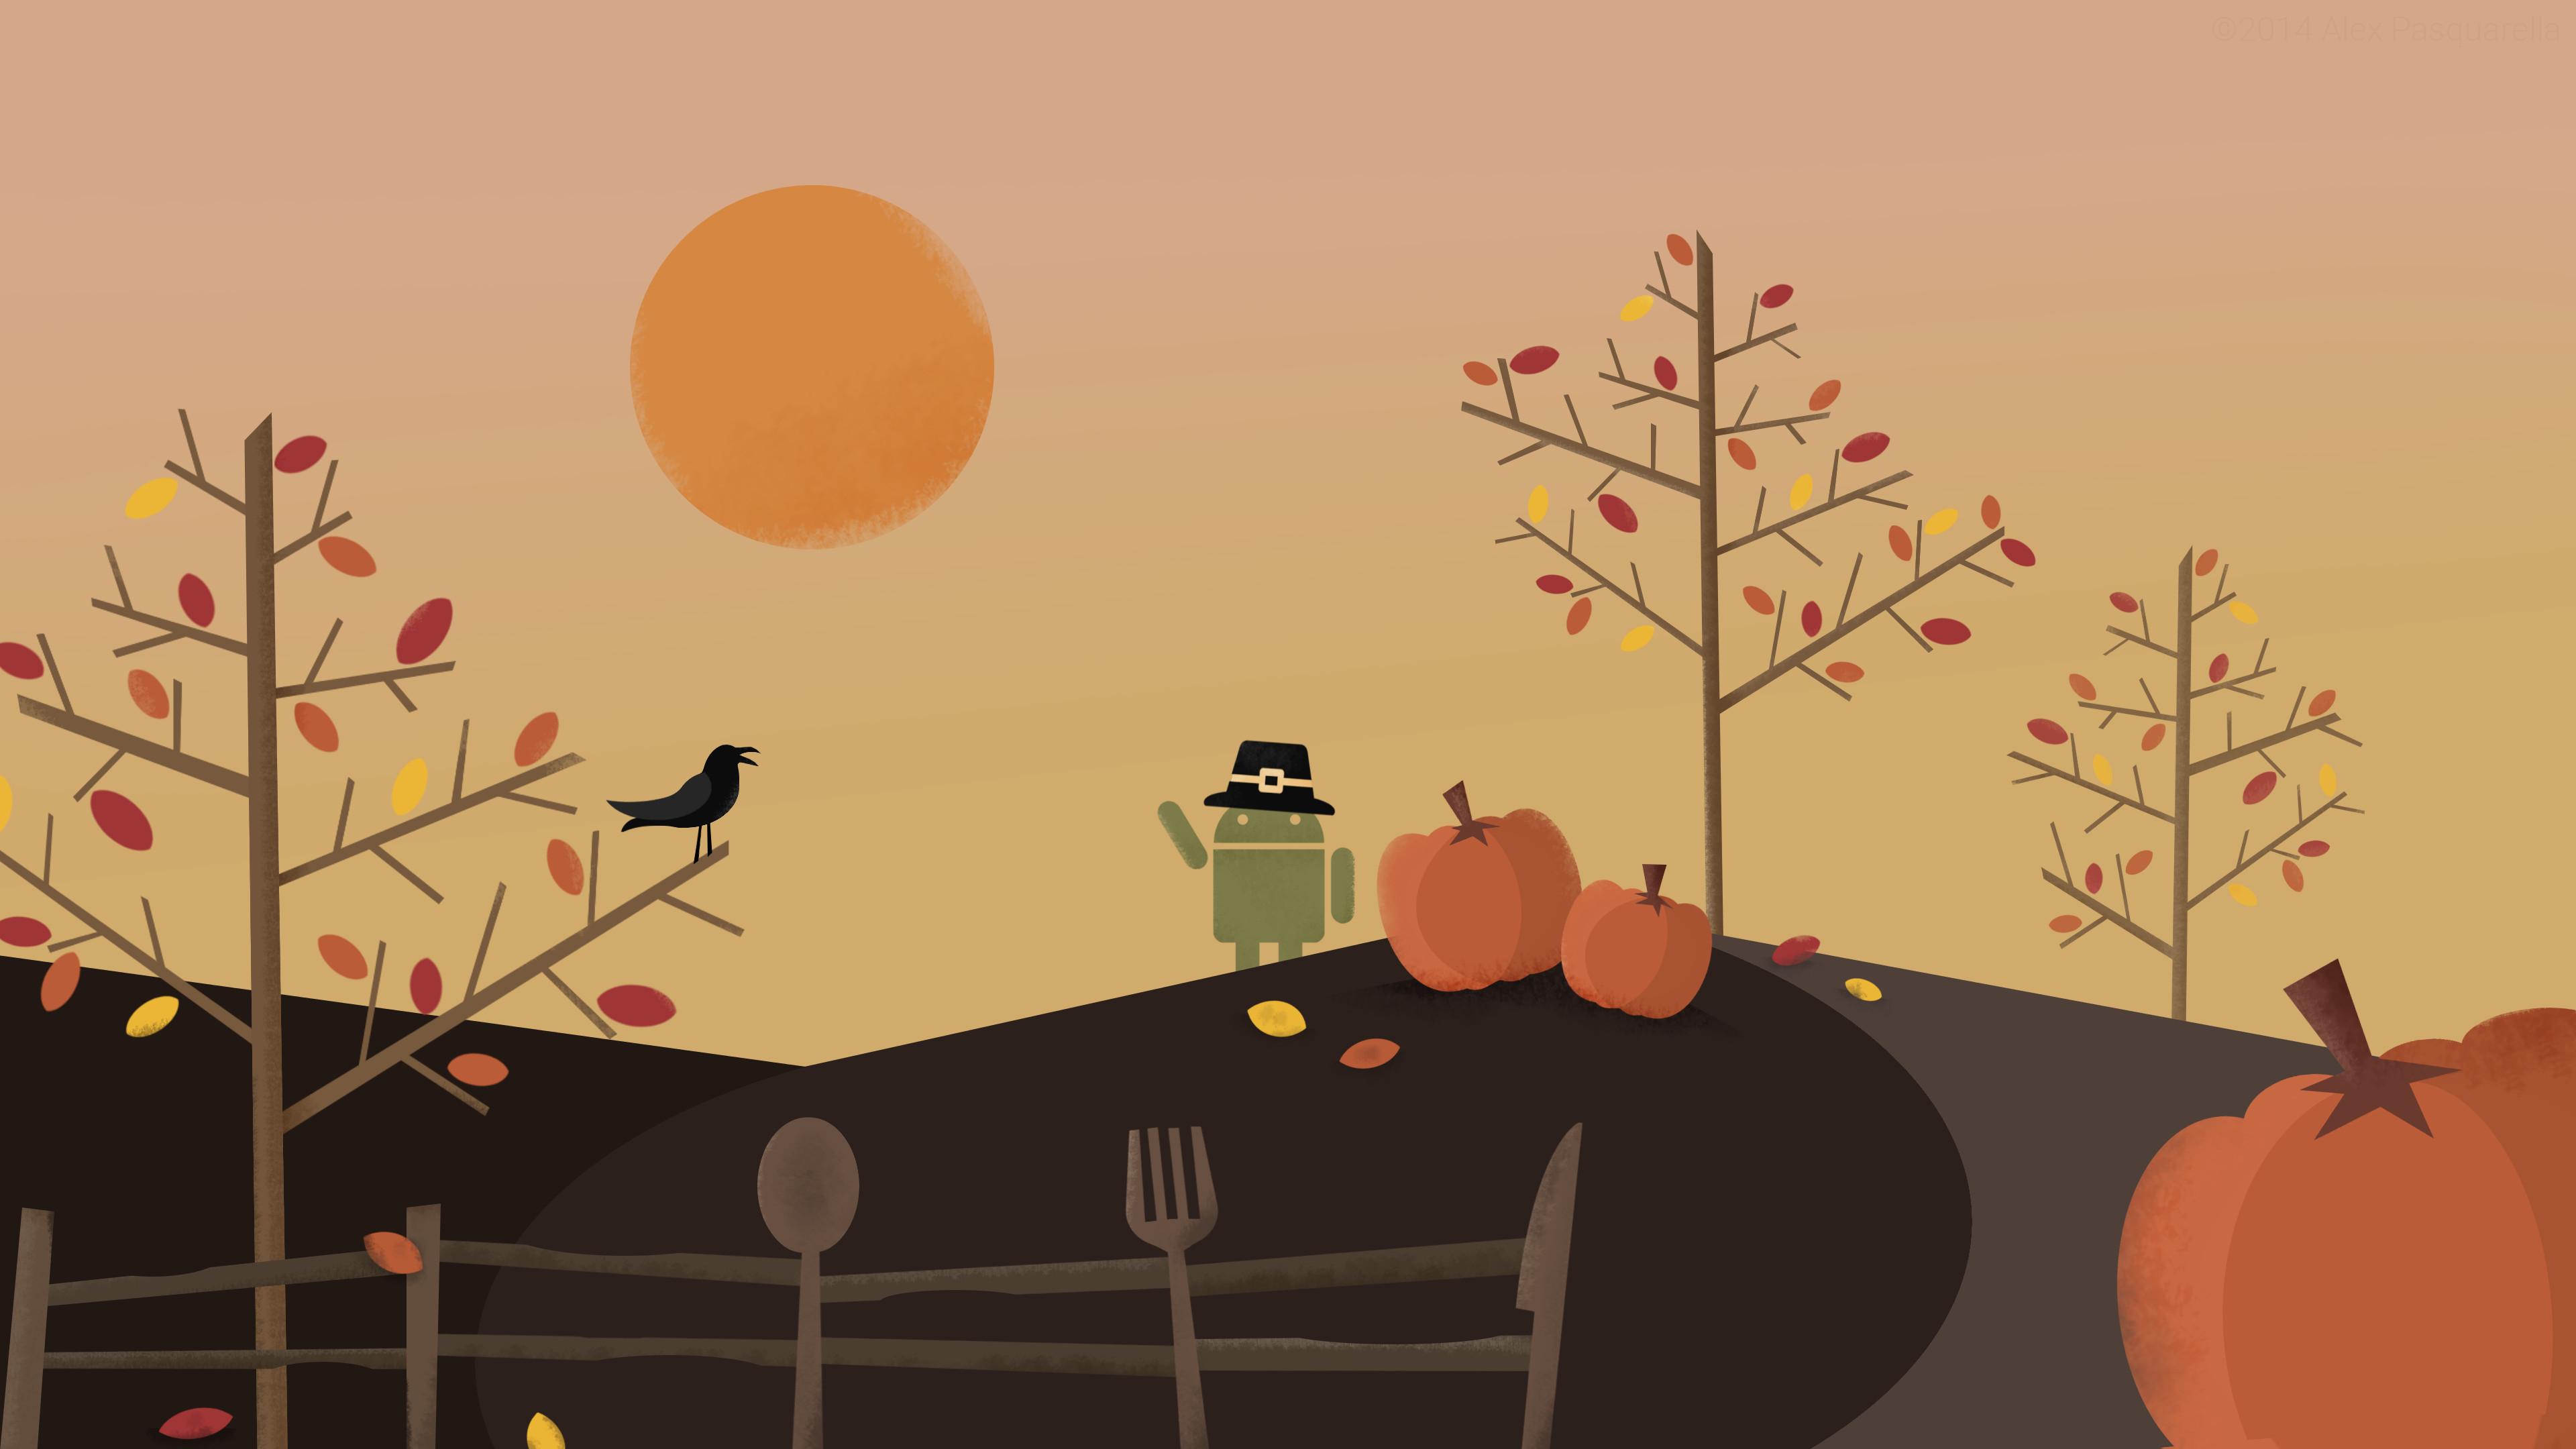 1920x1200 Thanksgiving Wallpapers Image Desktop AA